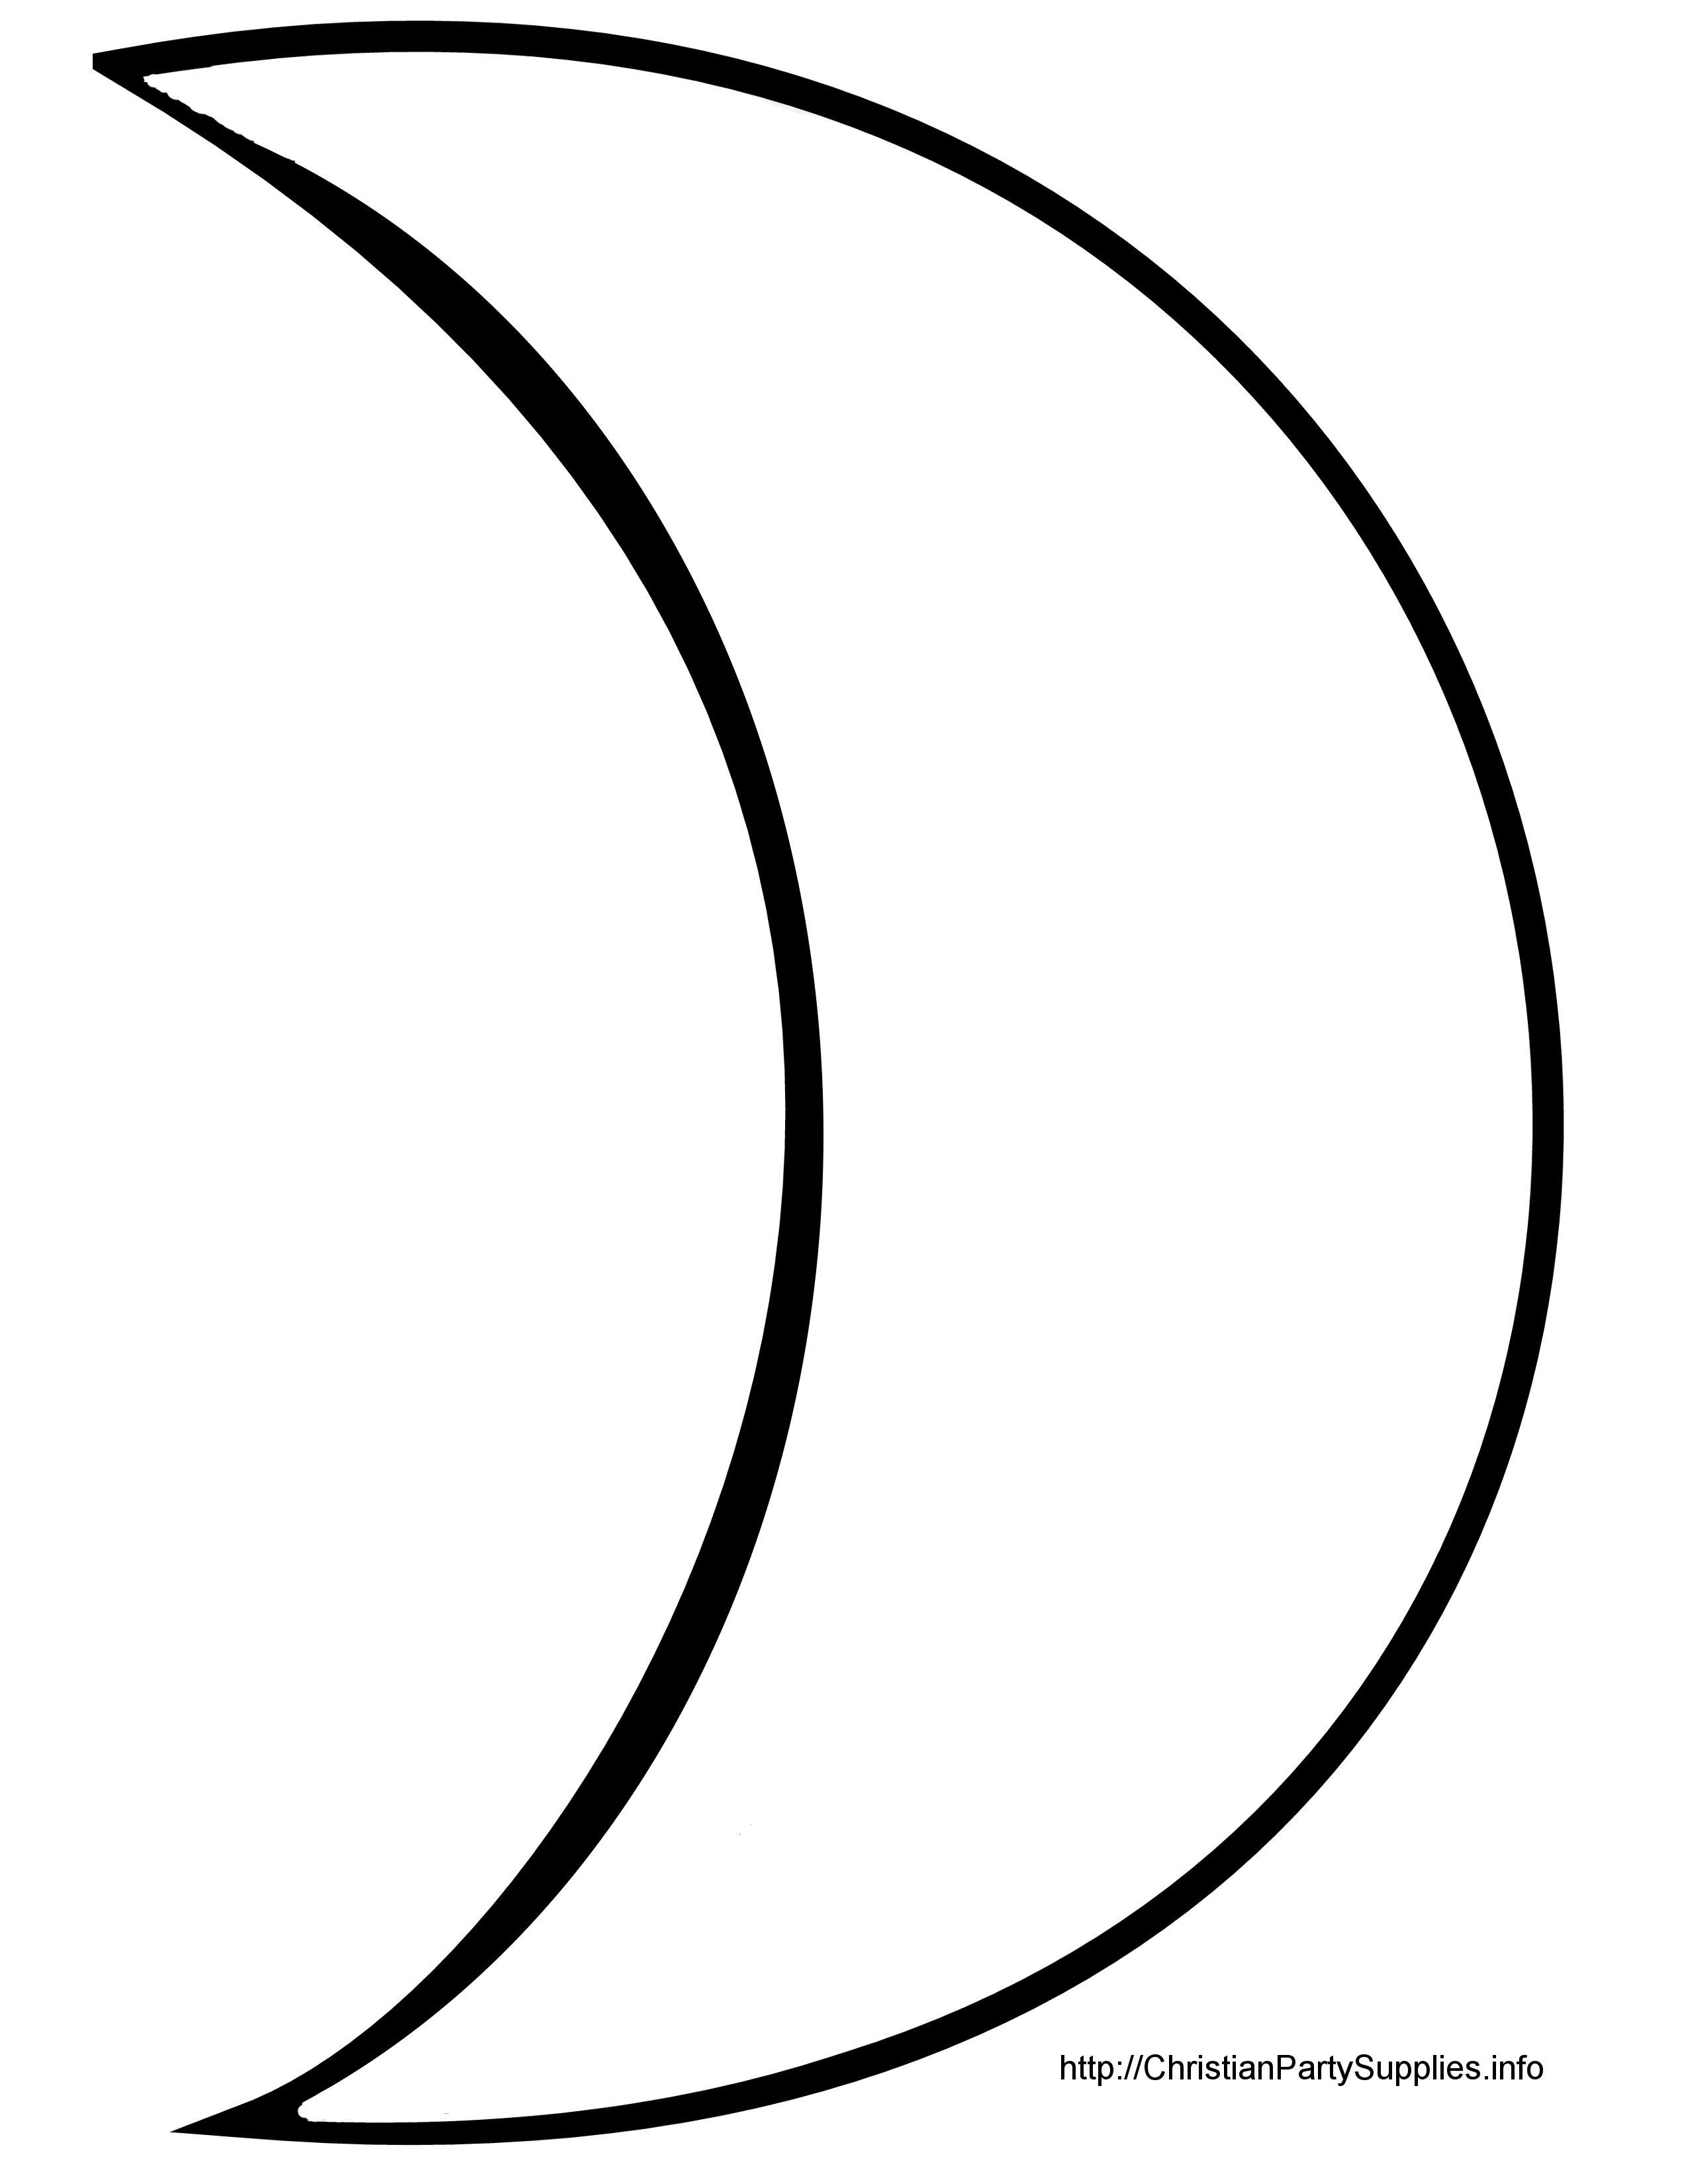 Template Crescent Moon